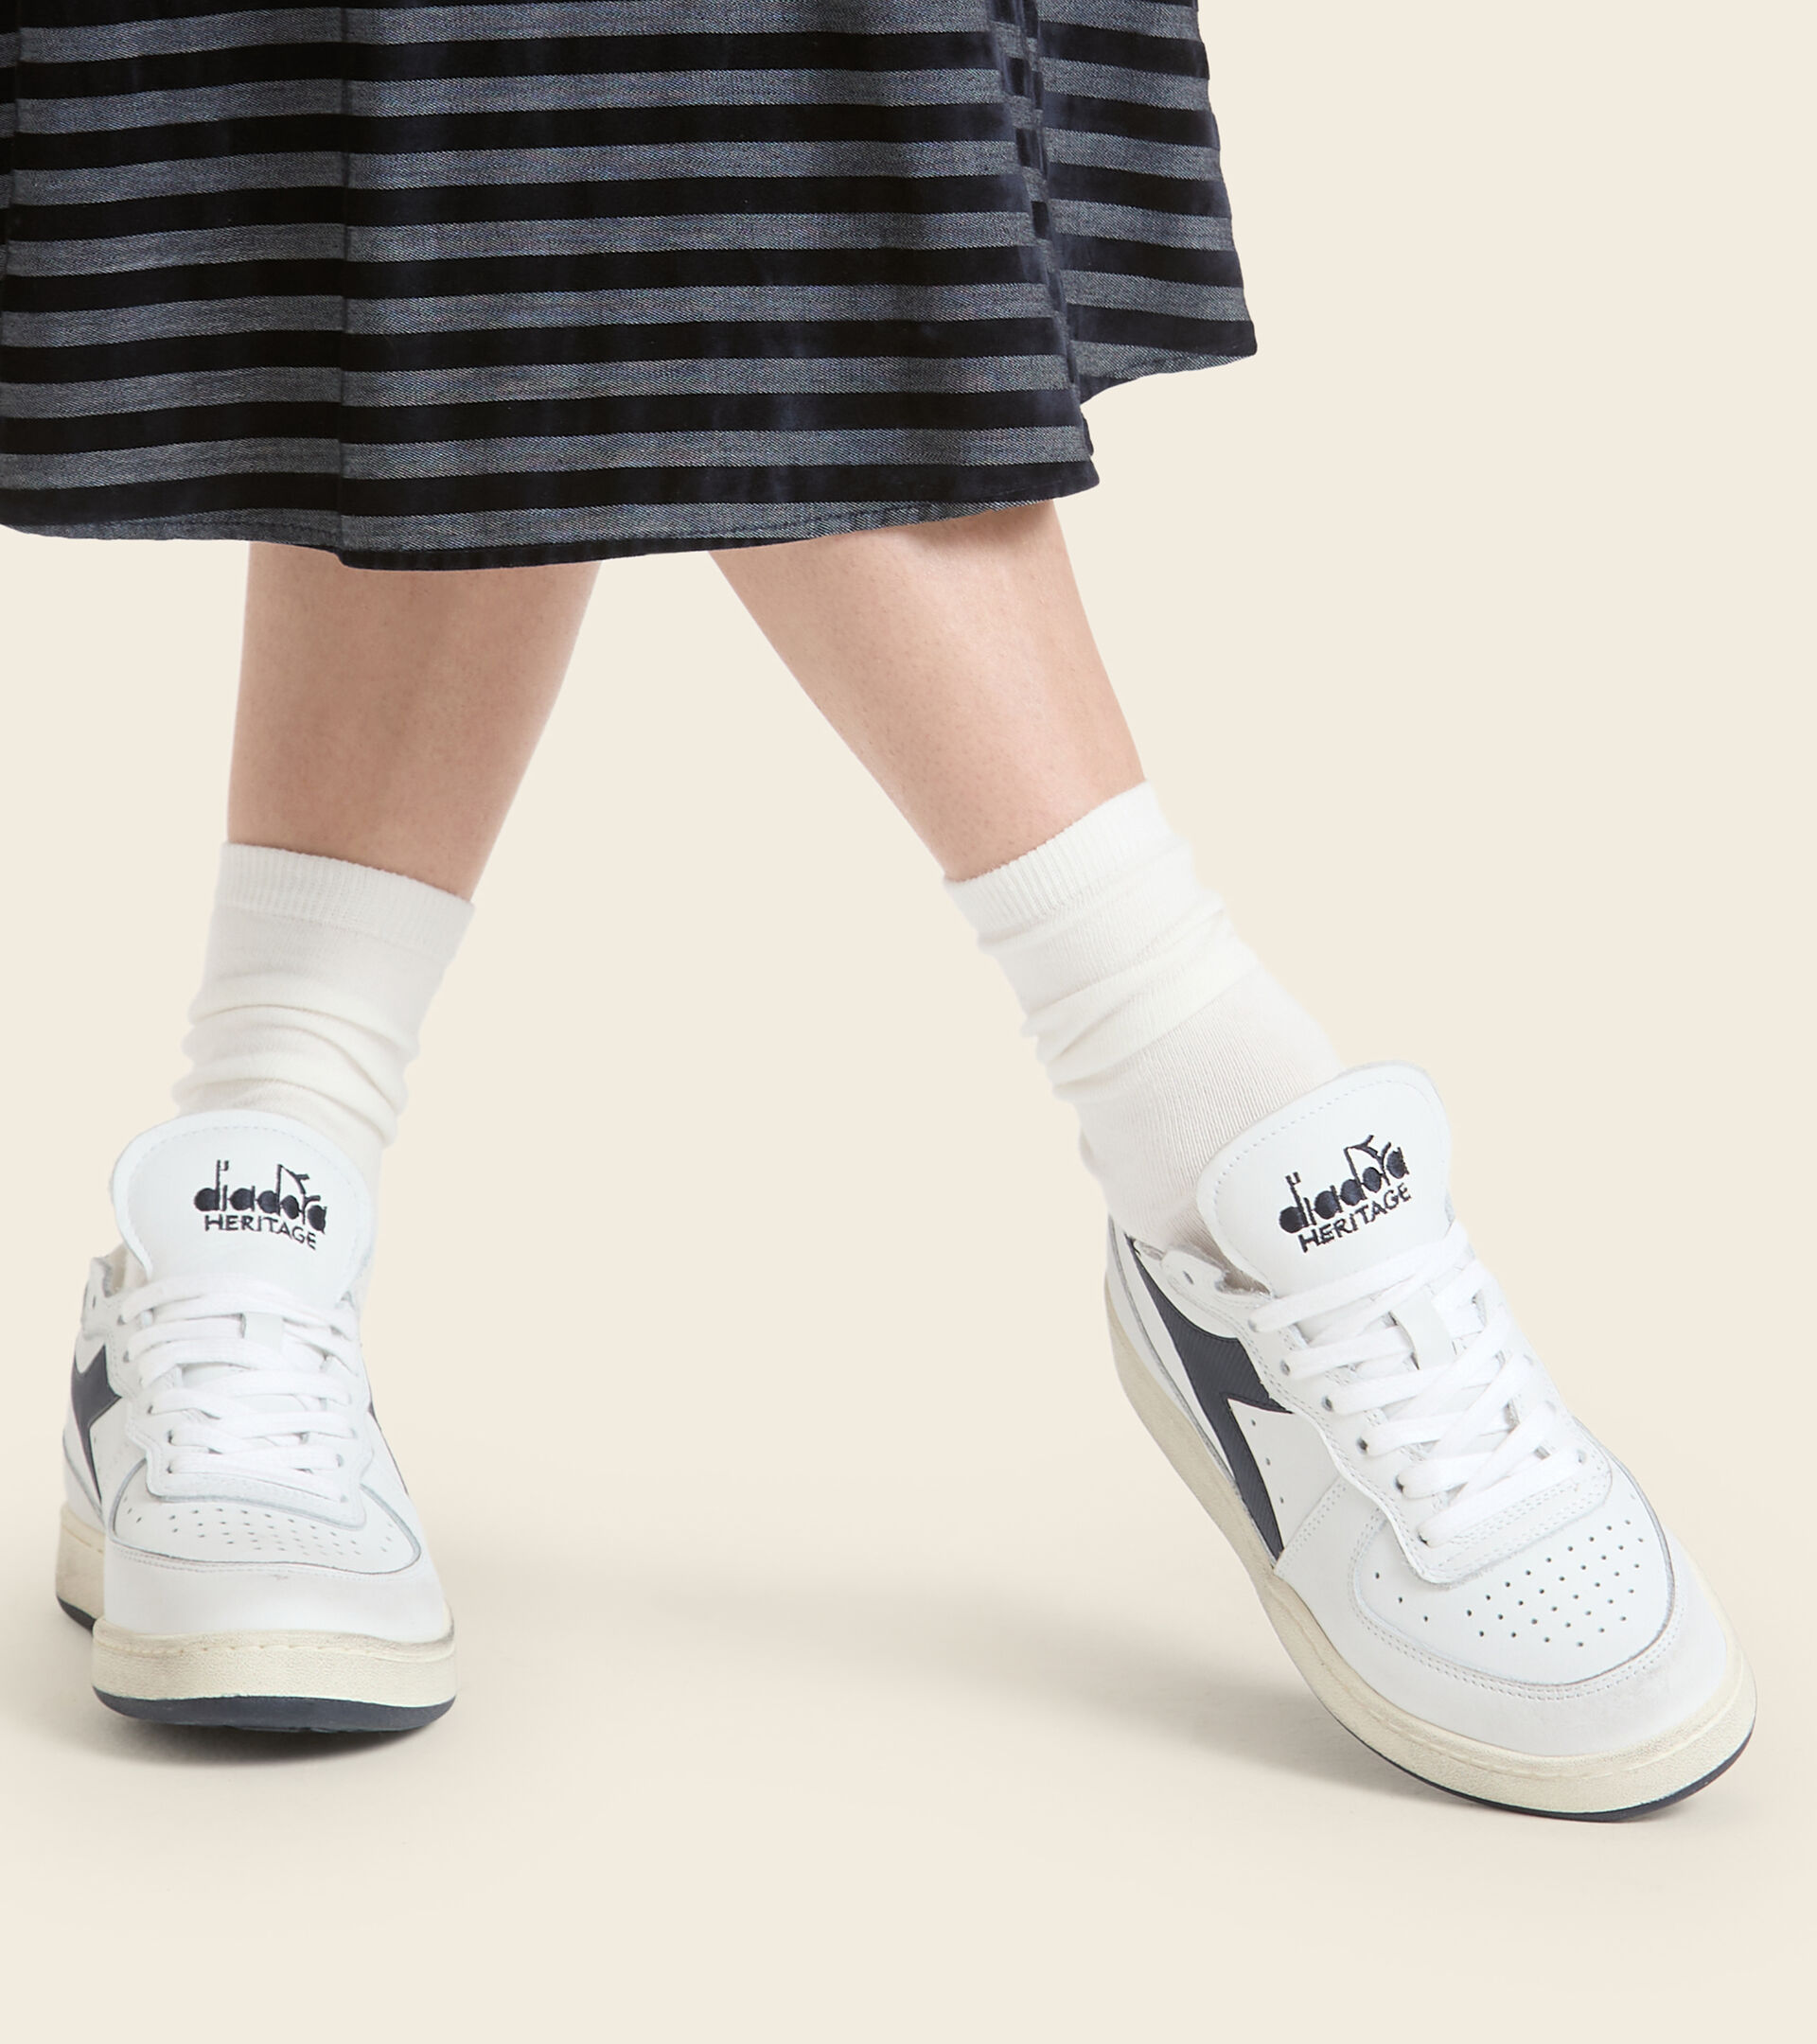 Footwear Heritage UNISEX MI BASKET ROW CUT WHITE/BLUE CORSAIR Diadora